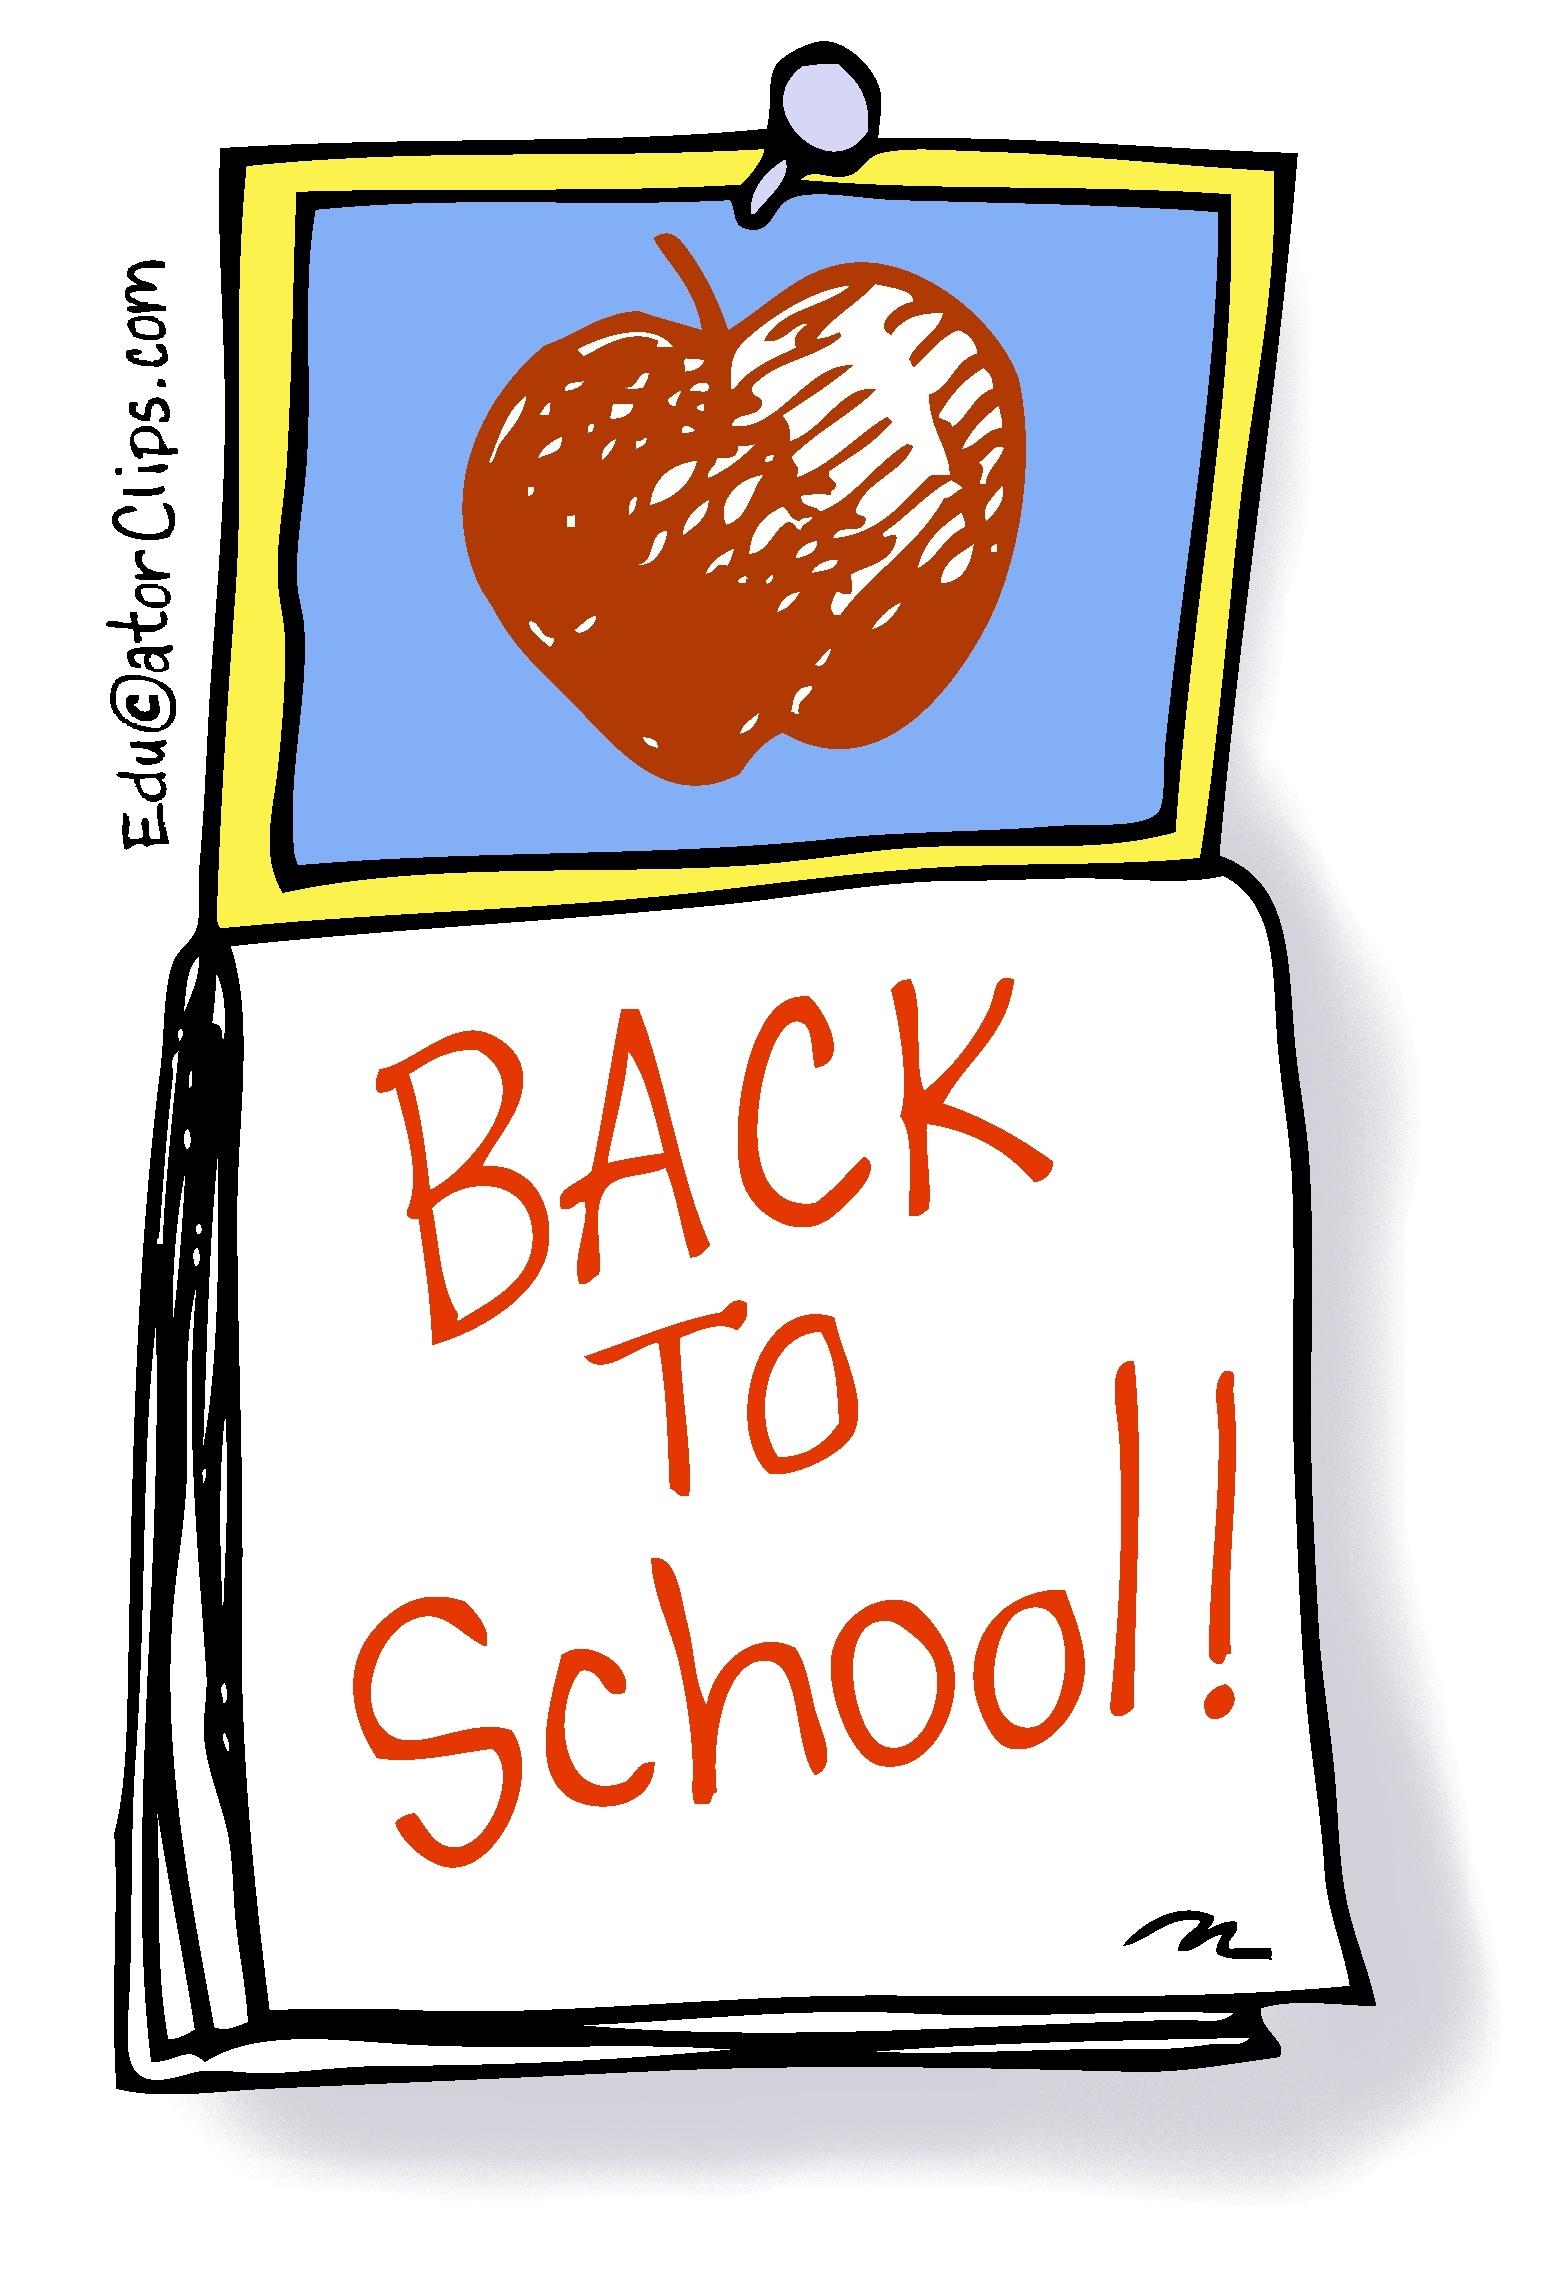 Clipart school calendar banner royalty free download Back to School Calendar Clip Art banner royalty free download